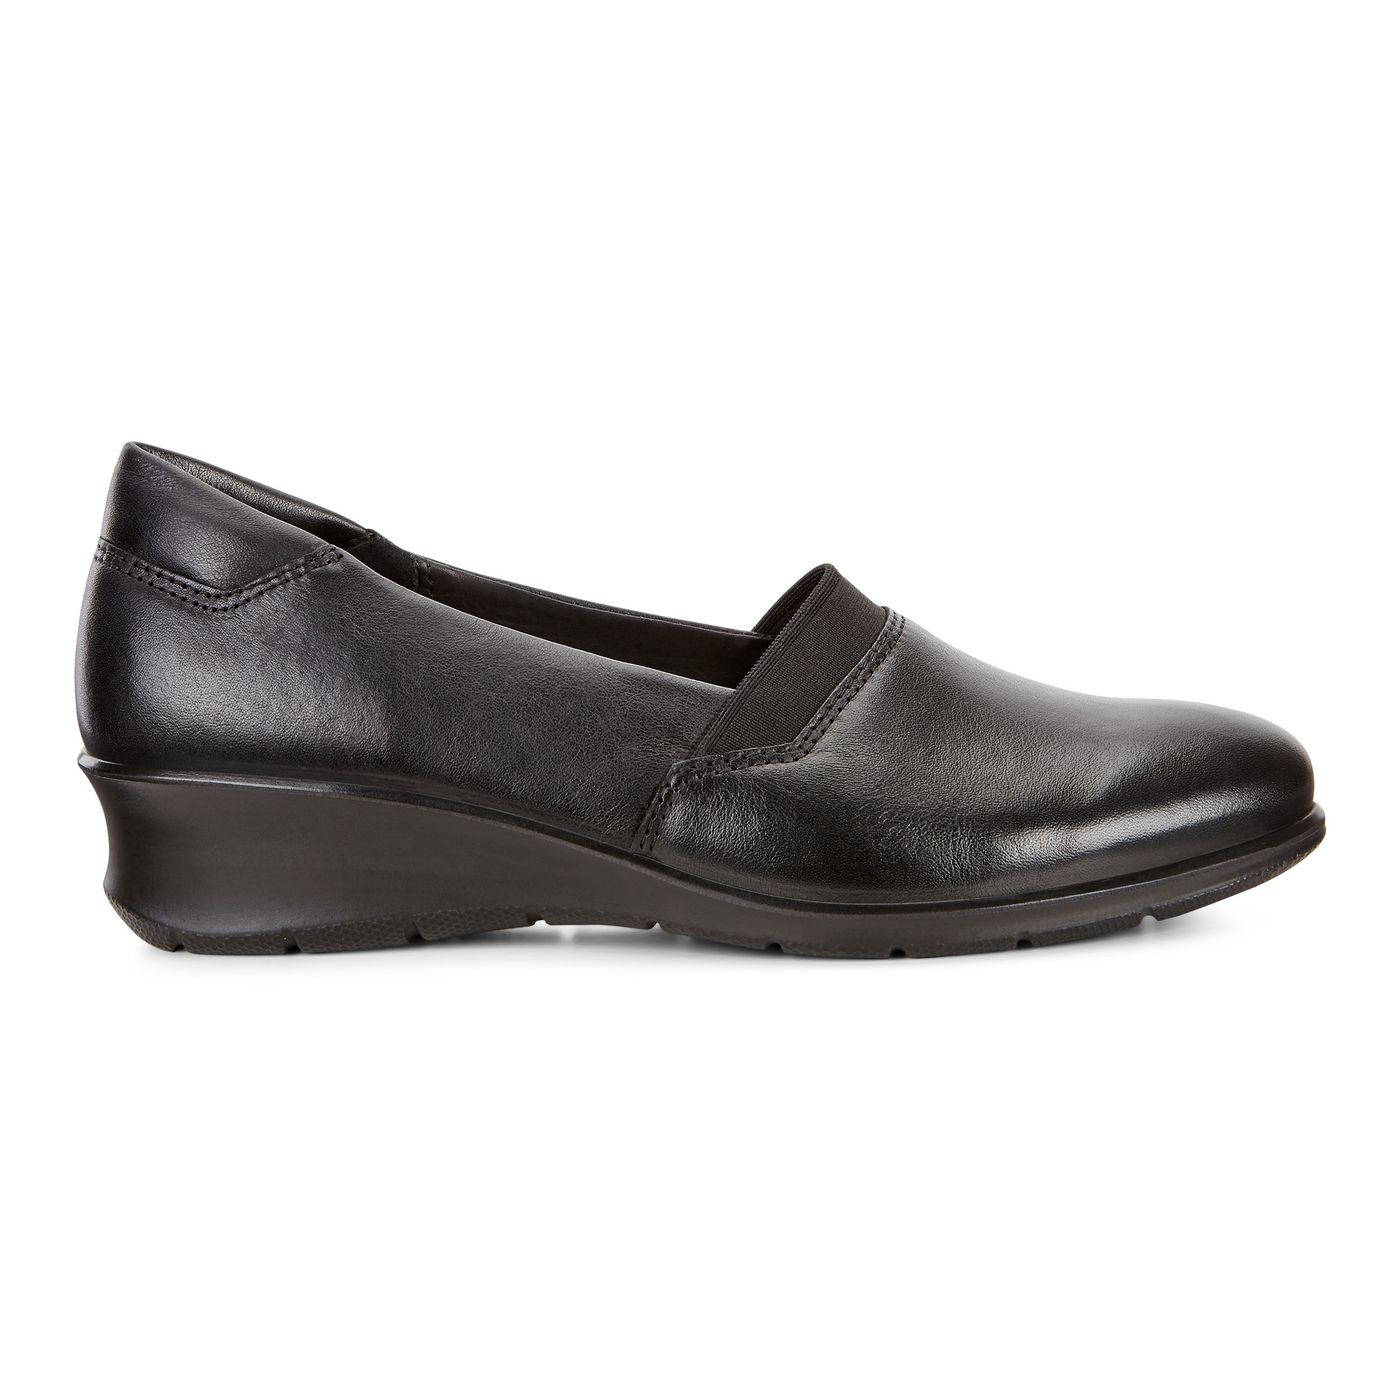 edf42fc41b ECCO Felicia Slip On II | Casual Women's Shoes | ECCO® Shoes in 2019 ...